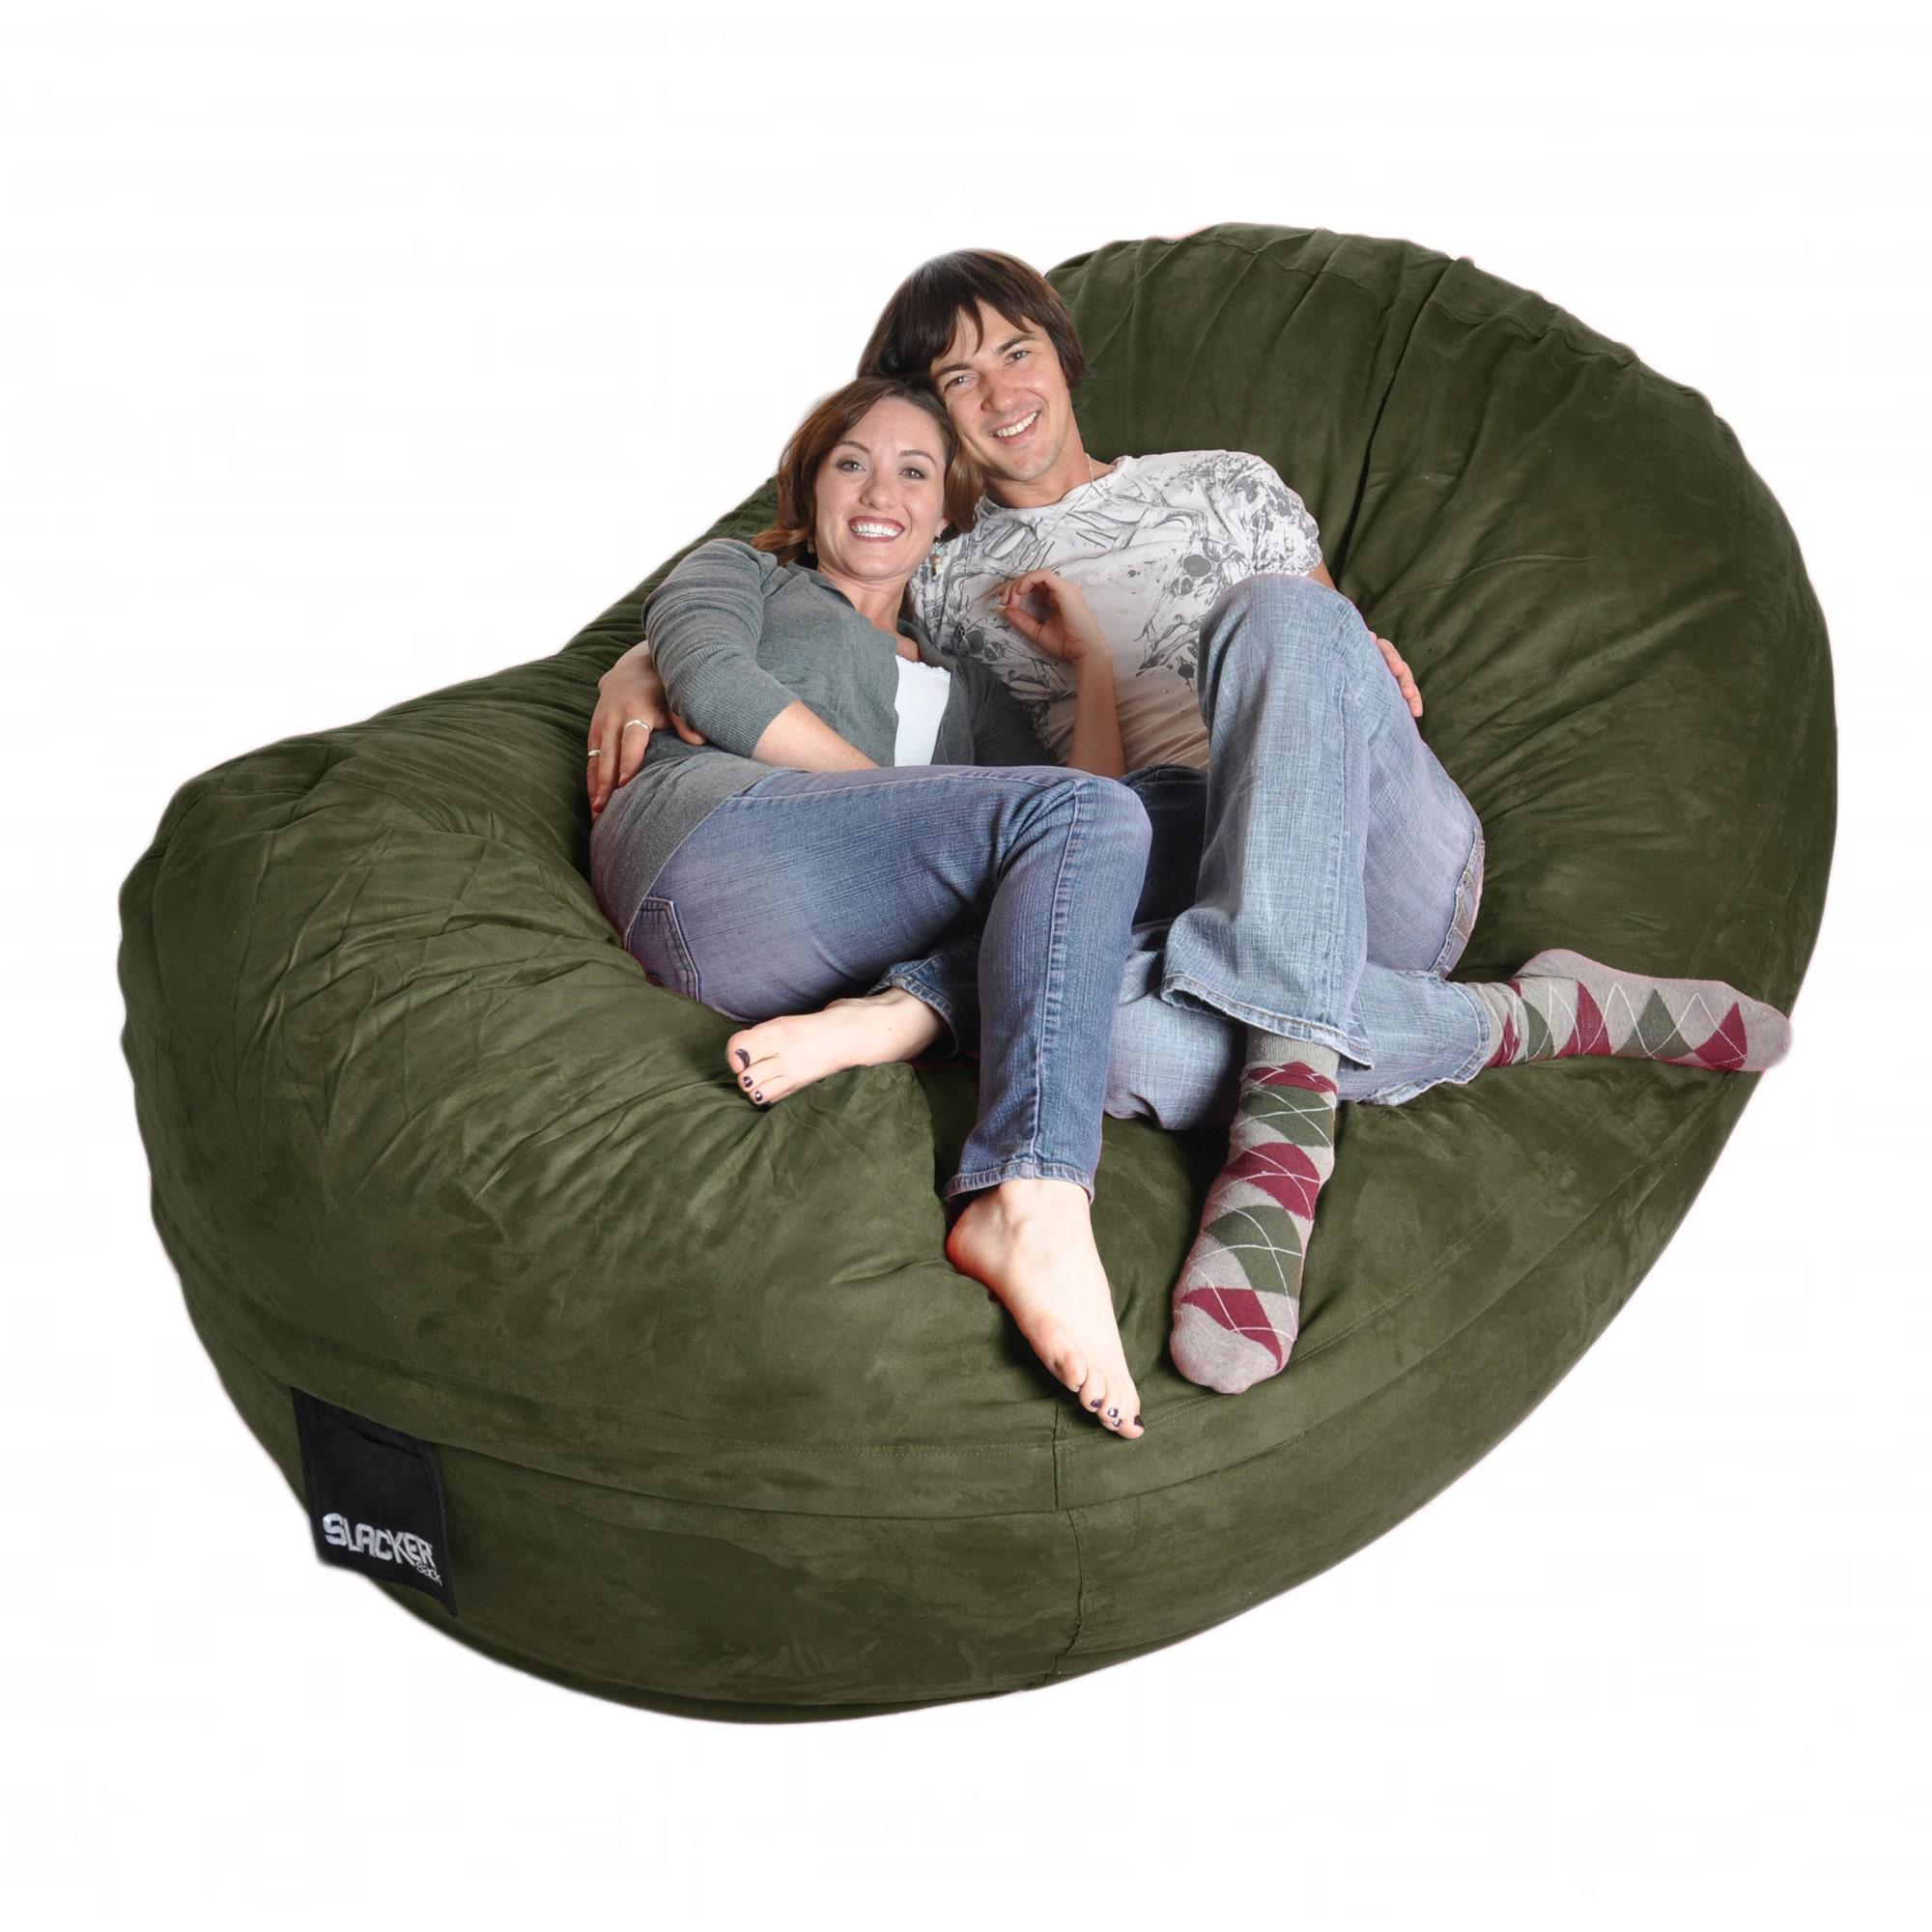 Slacker Sack Eight-foot Olive Green Oval Microfiber/ Foam Bean Bag